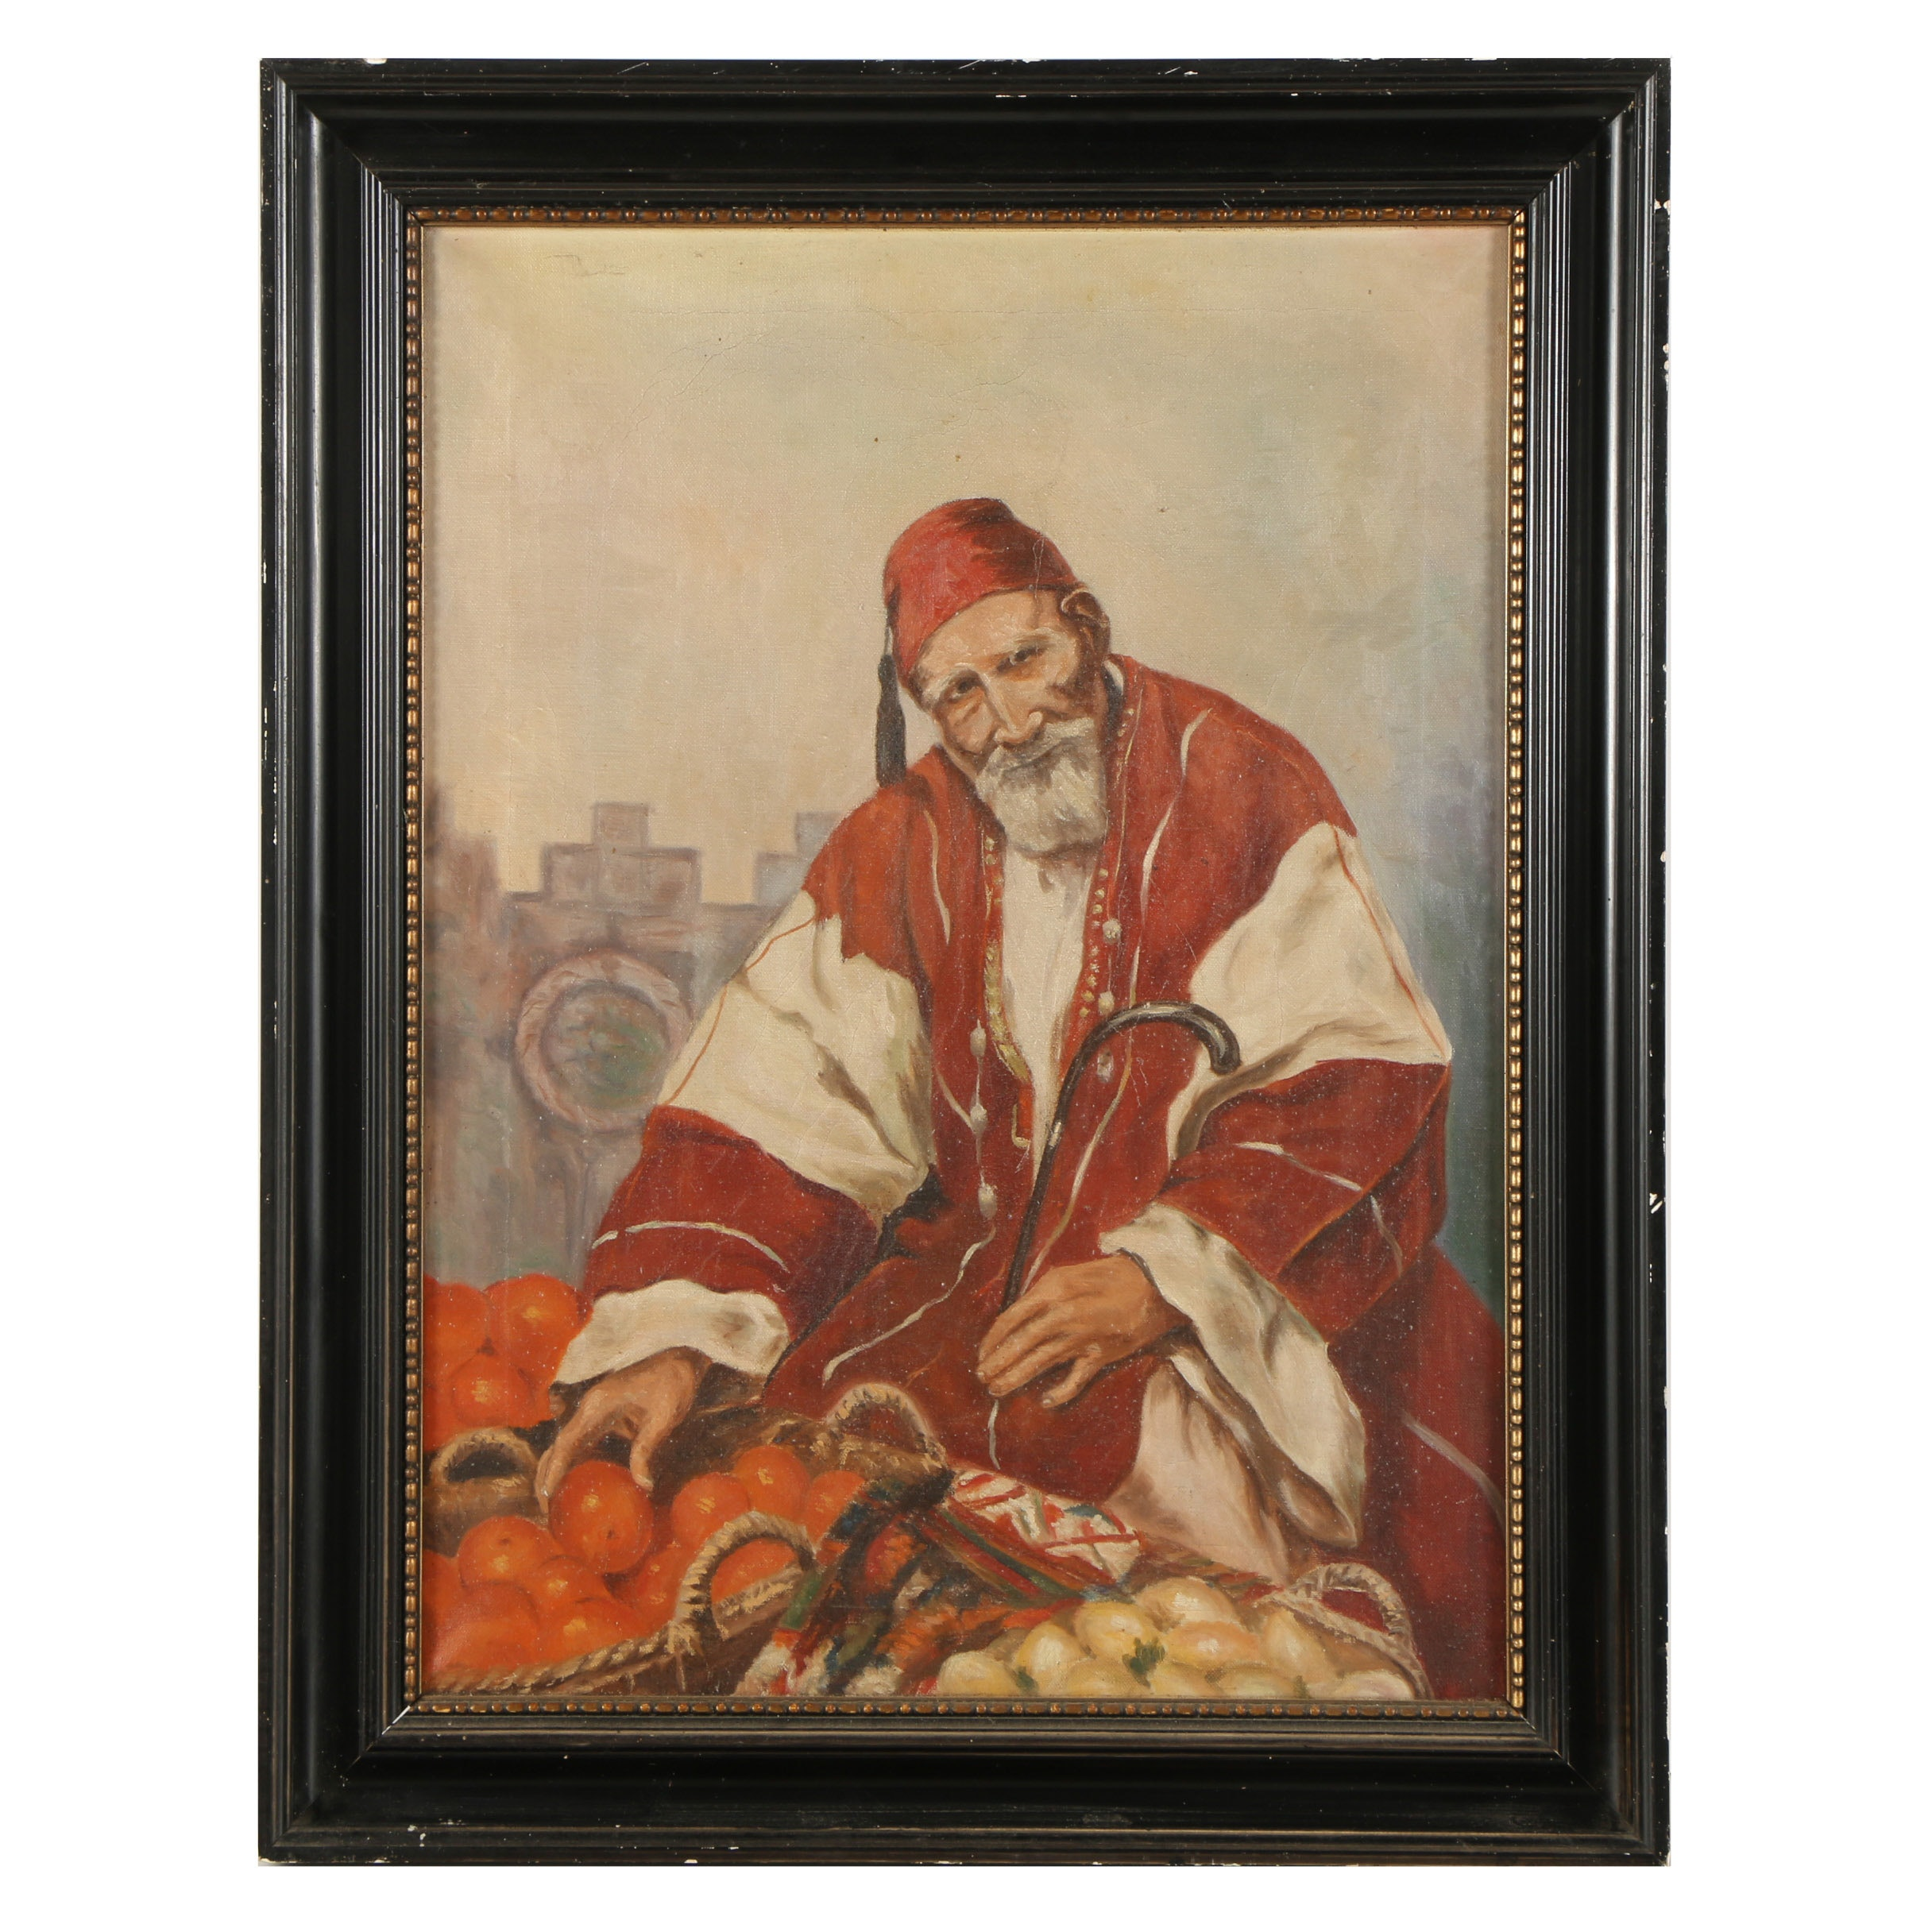 Early 20th Century Oil Portrait of Produce Market Vendor